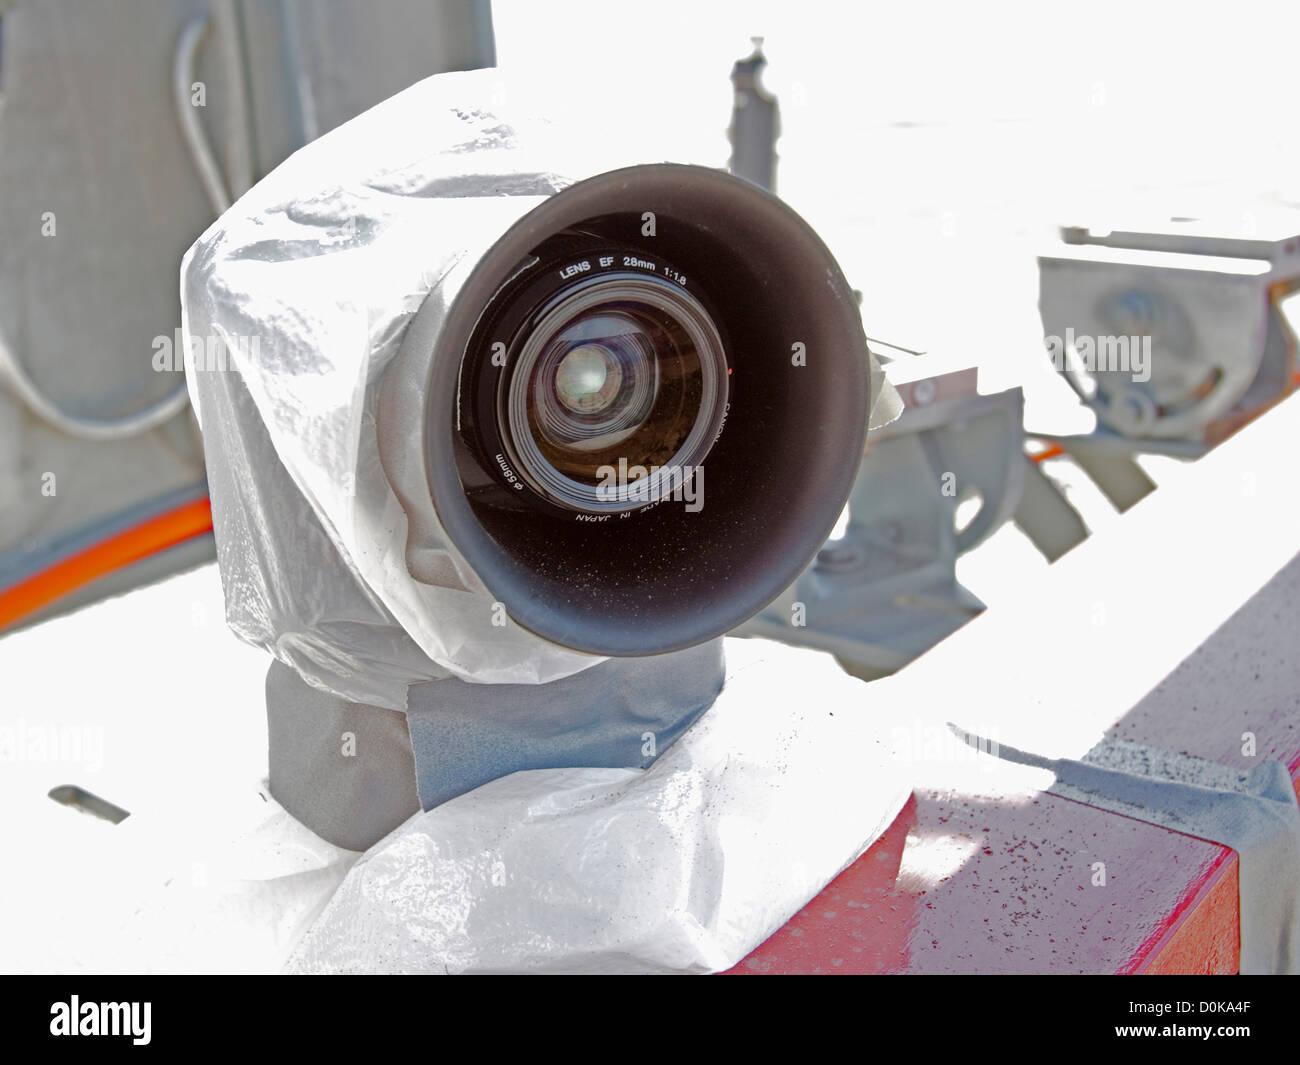 Rocket Camera : Remote control camera closest to rocket test shows sandblasting from